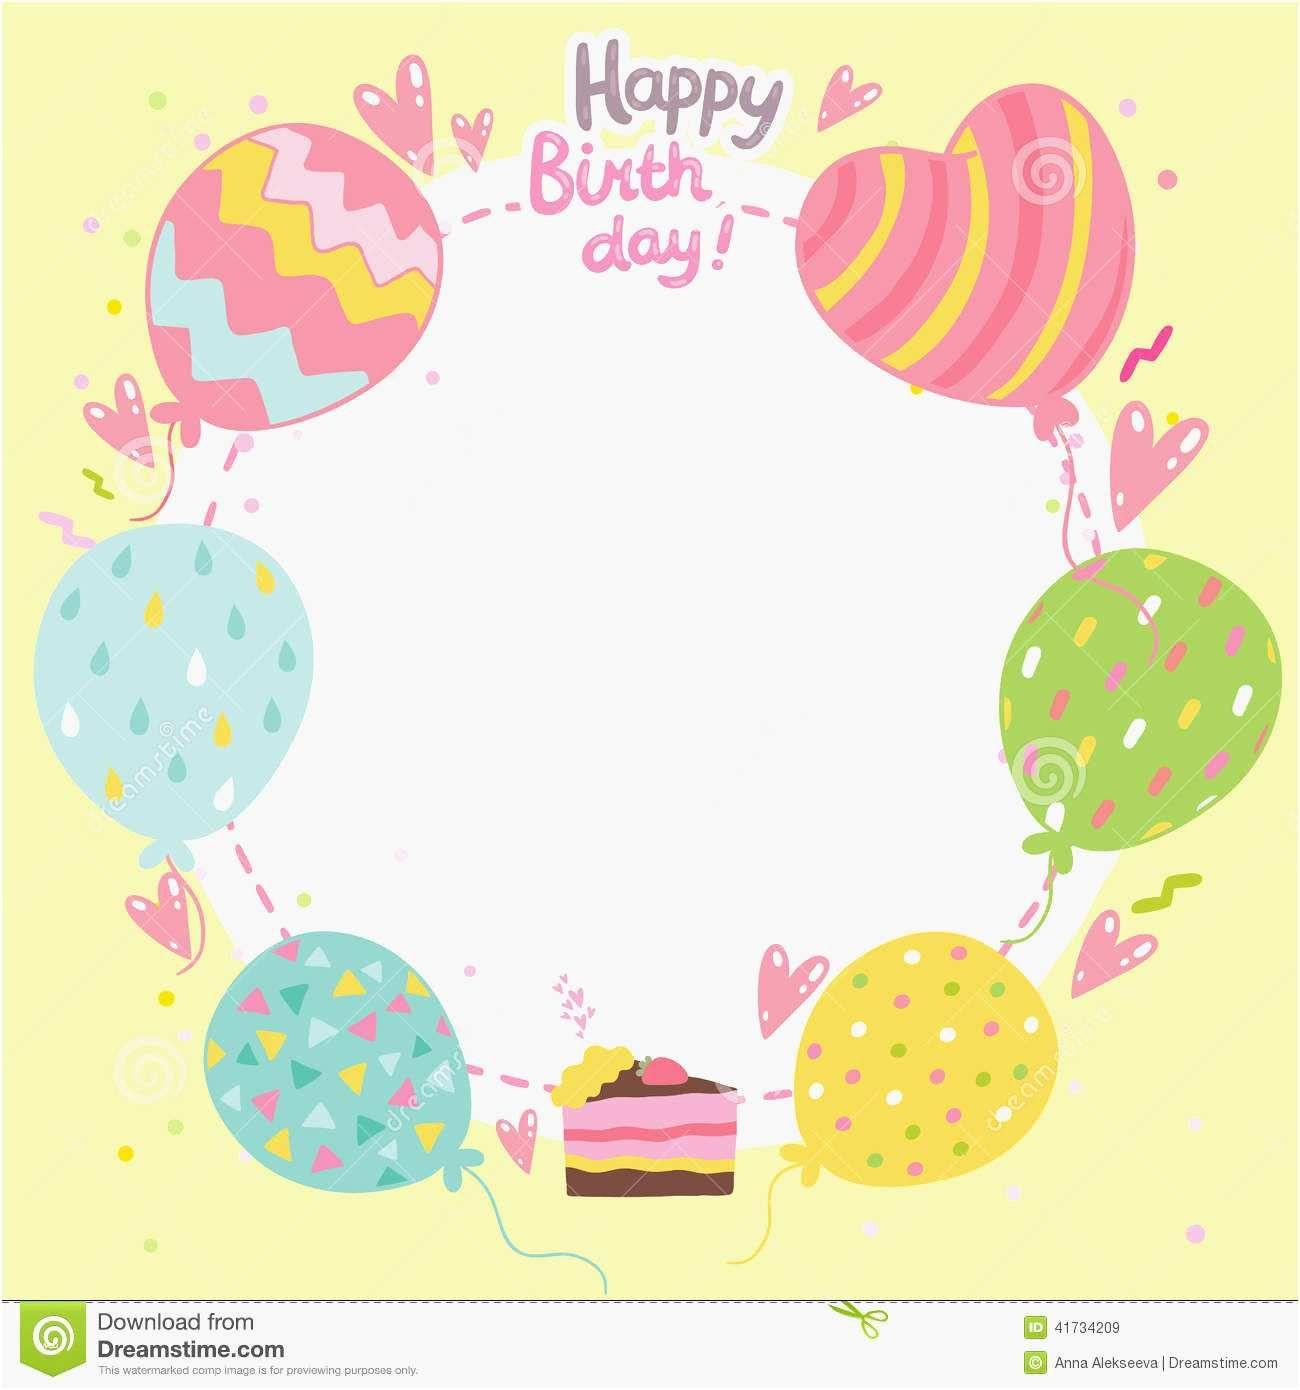 Birthday Card Template Free Greeting Word Blank Quarter Fold Intended For Blank Quarter Fold Card Tem Kartu Selamat Ulang Tahun Template Kartu Templat Undangan